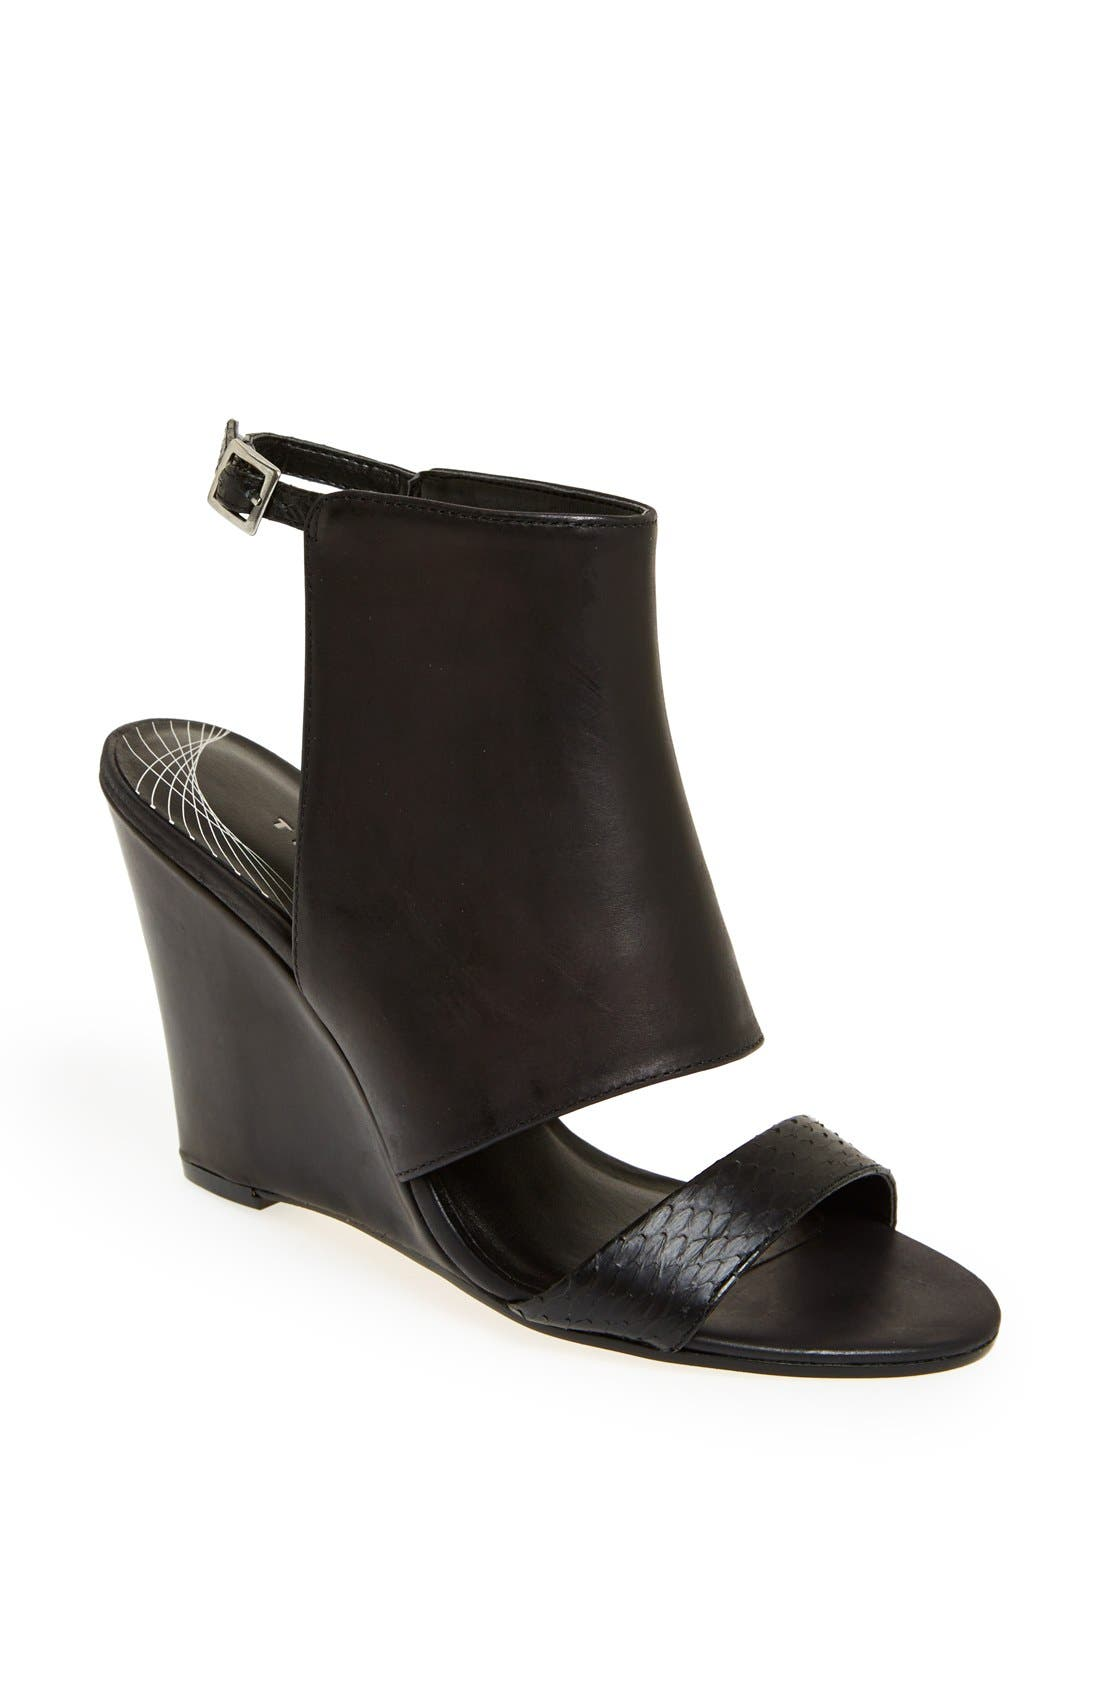 Main Image - Trouvé 'Raley' Cuff Wedge Sandal